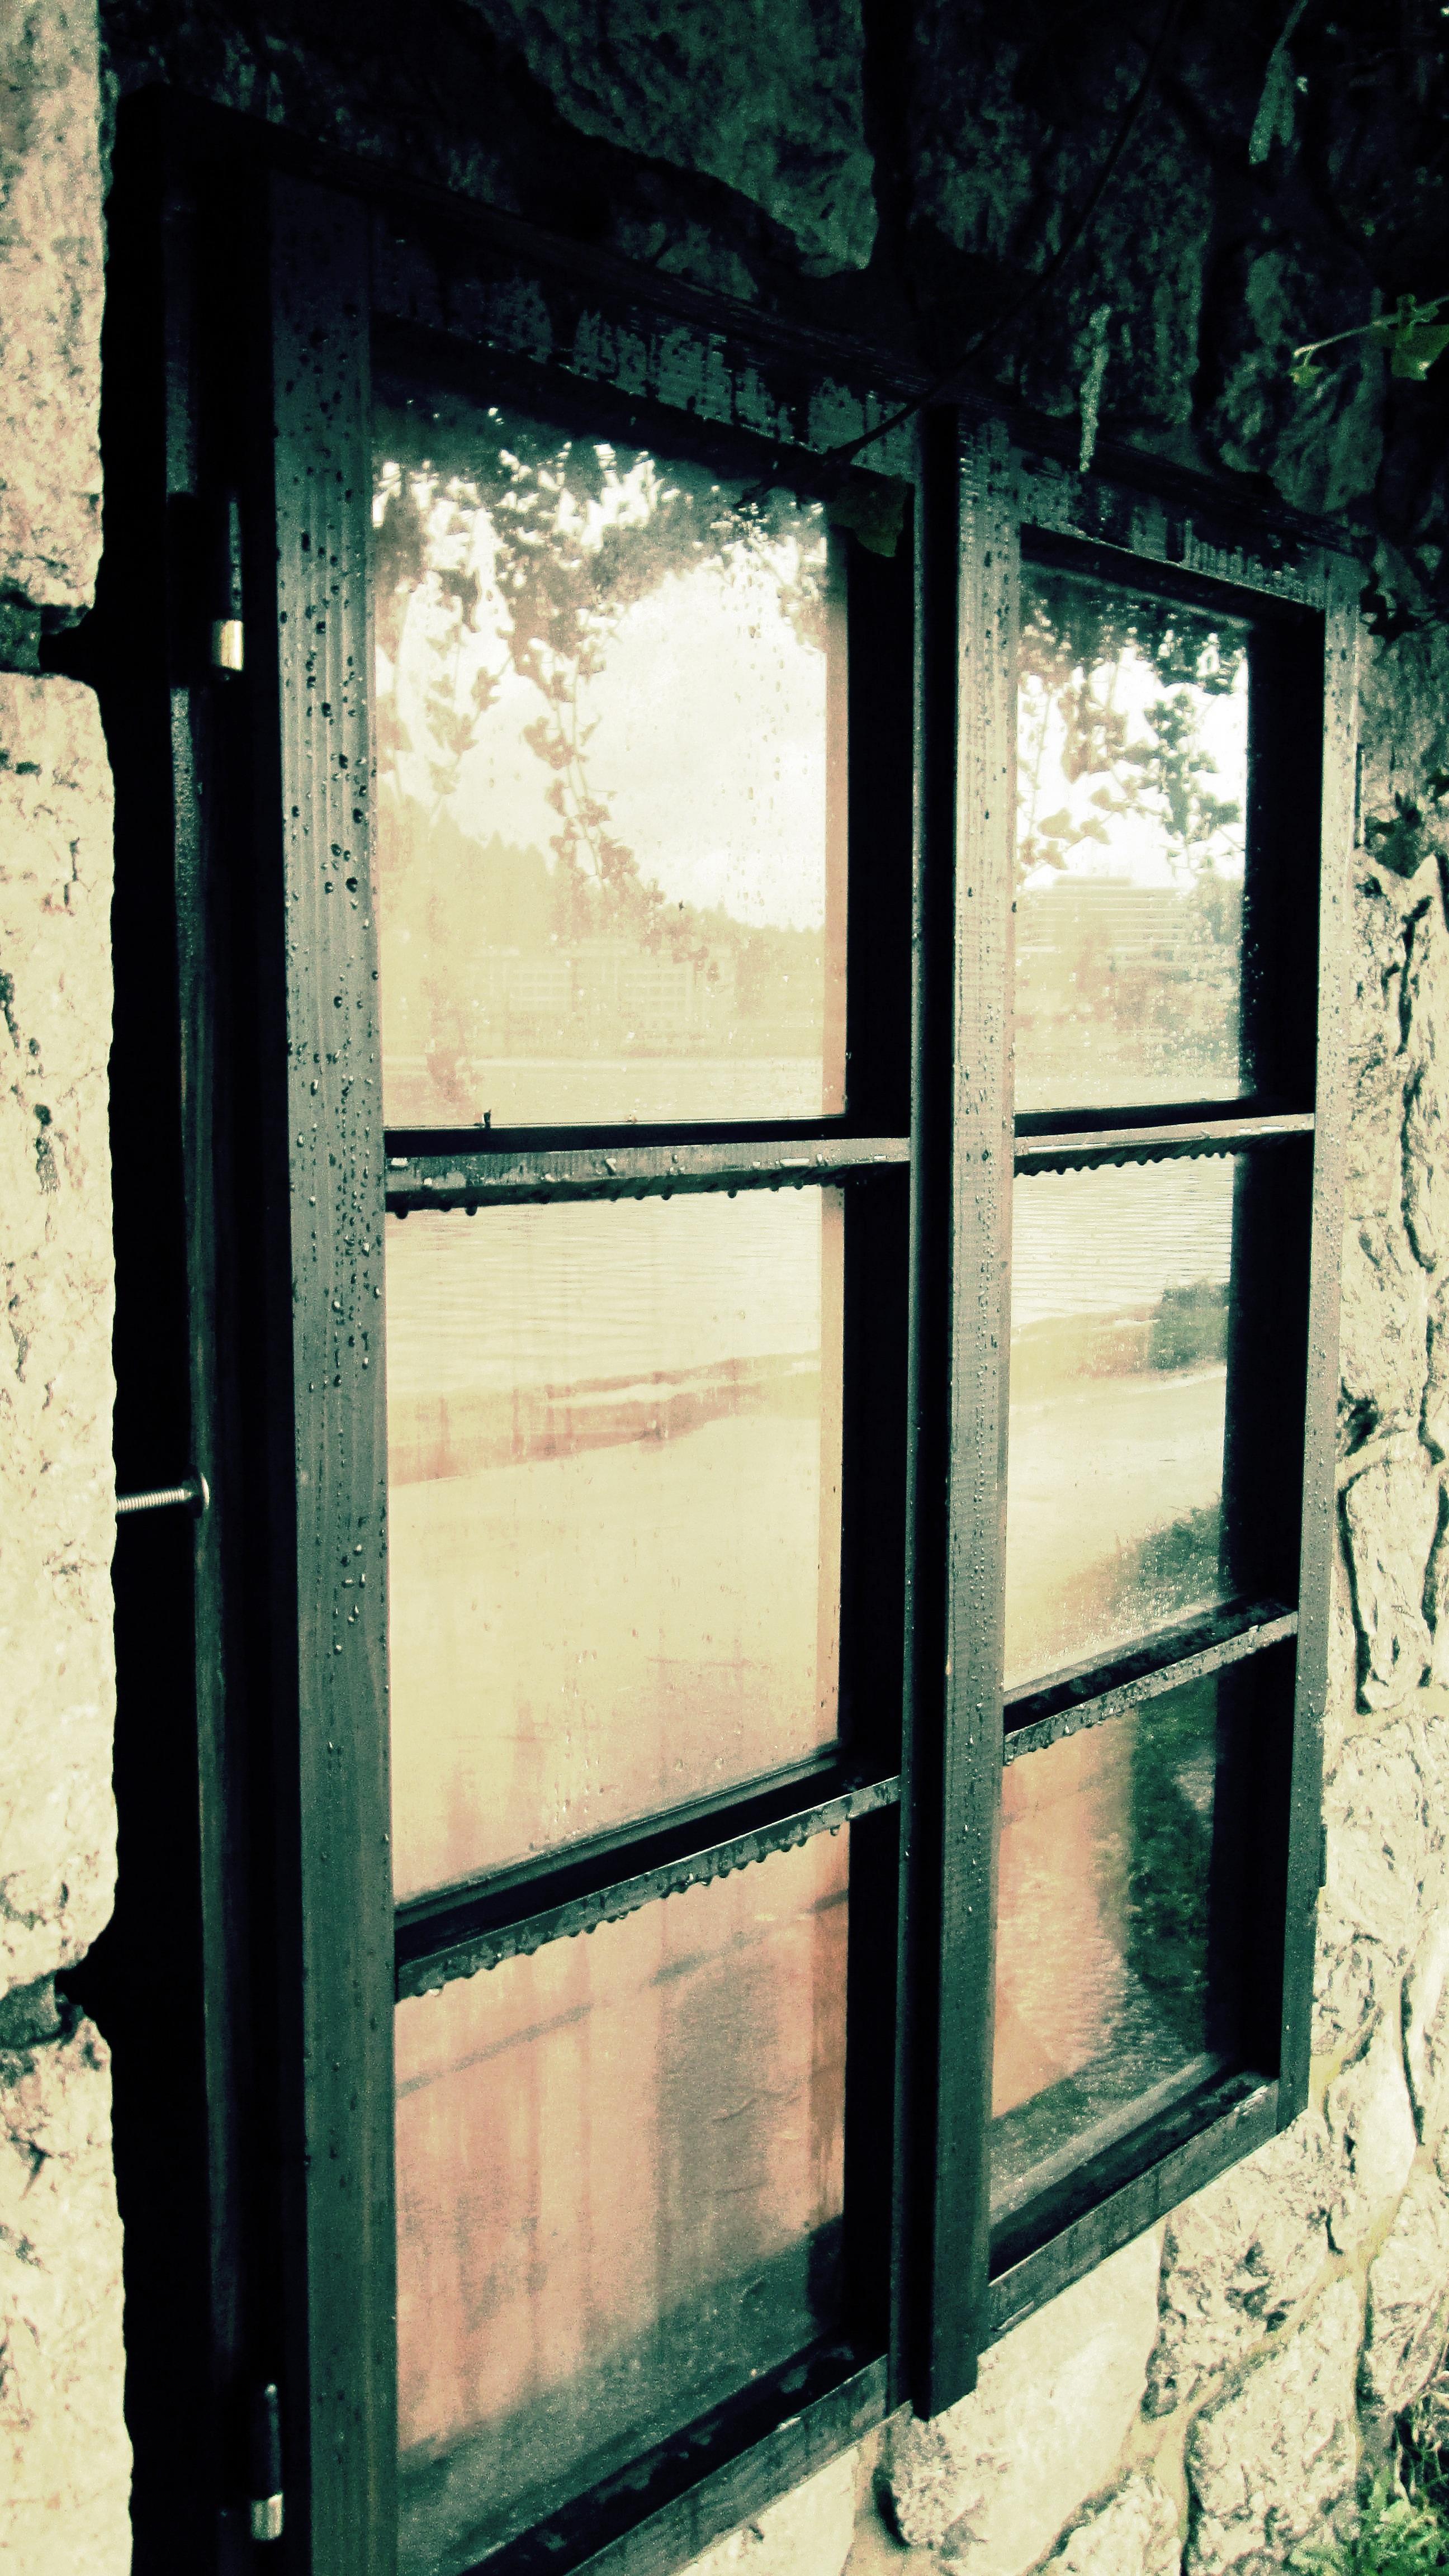 Wood House Rain Window Glass Raindrop Wet Wall Green Reflection Color  Grunge Furniture Door Interior Design